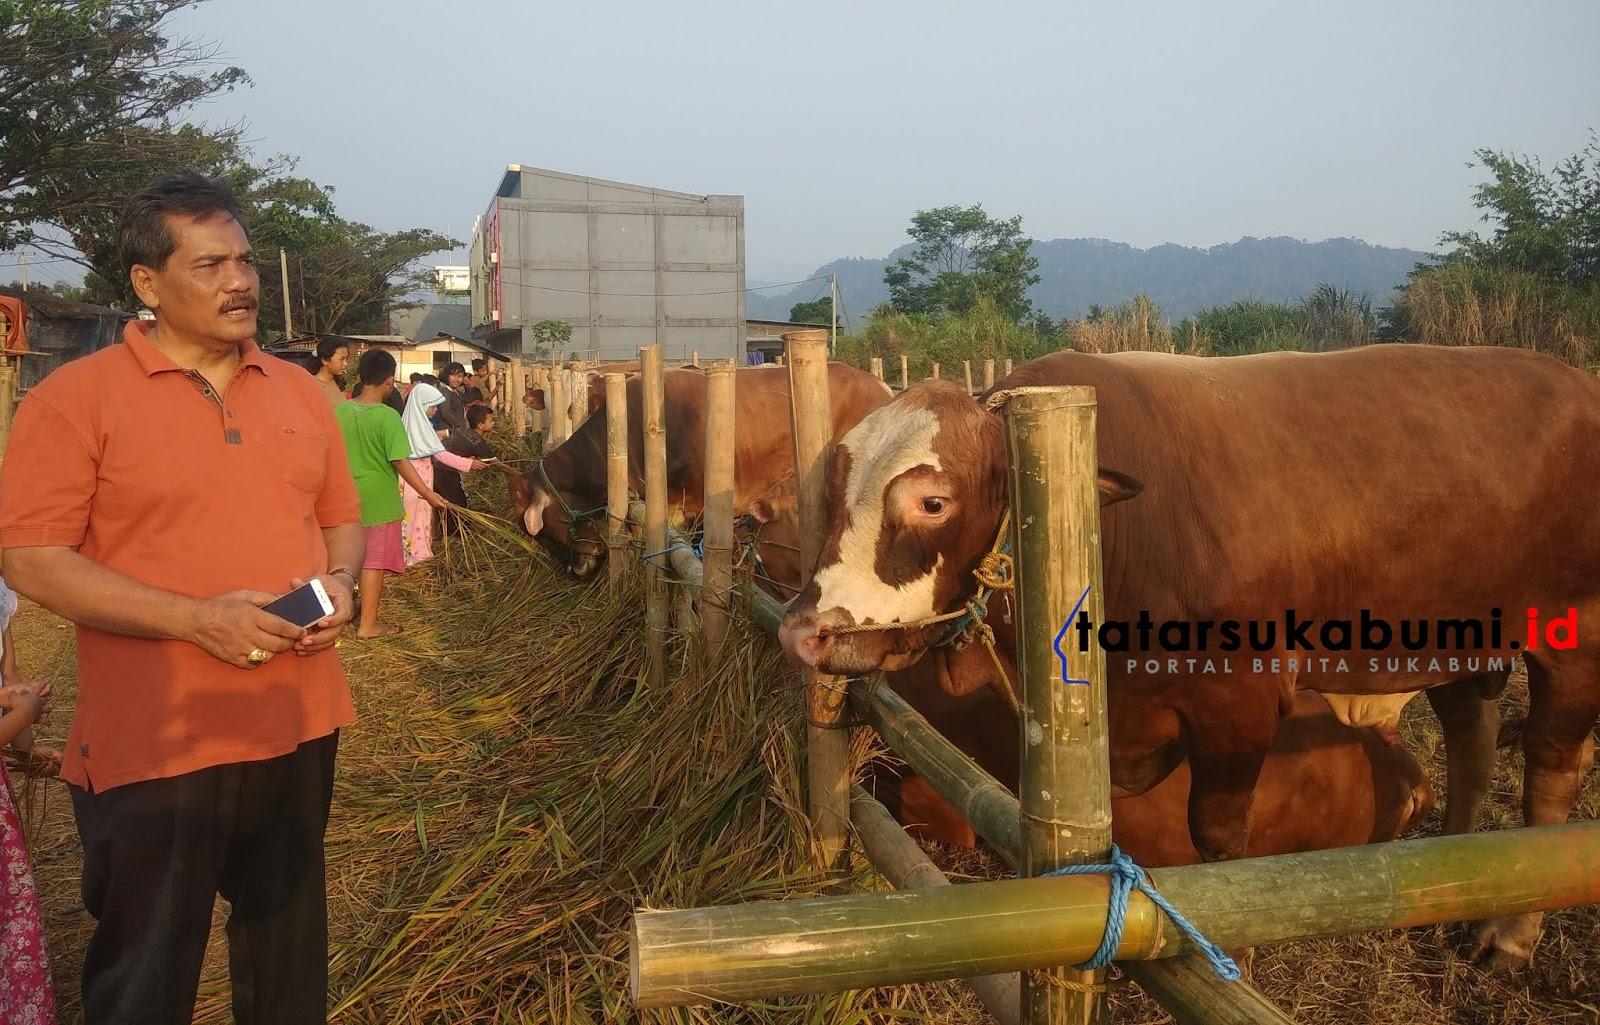 Pedagang Musiman Hewan Qurban di Sukabumi Mulai Menjamur, Harga Sapi Naik 2 Juta